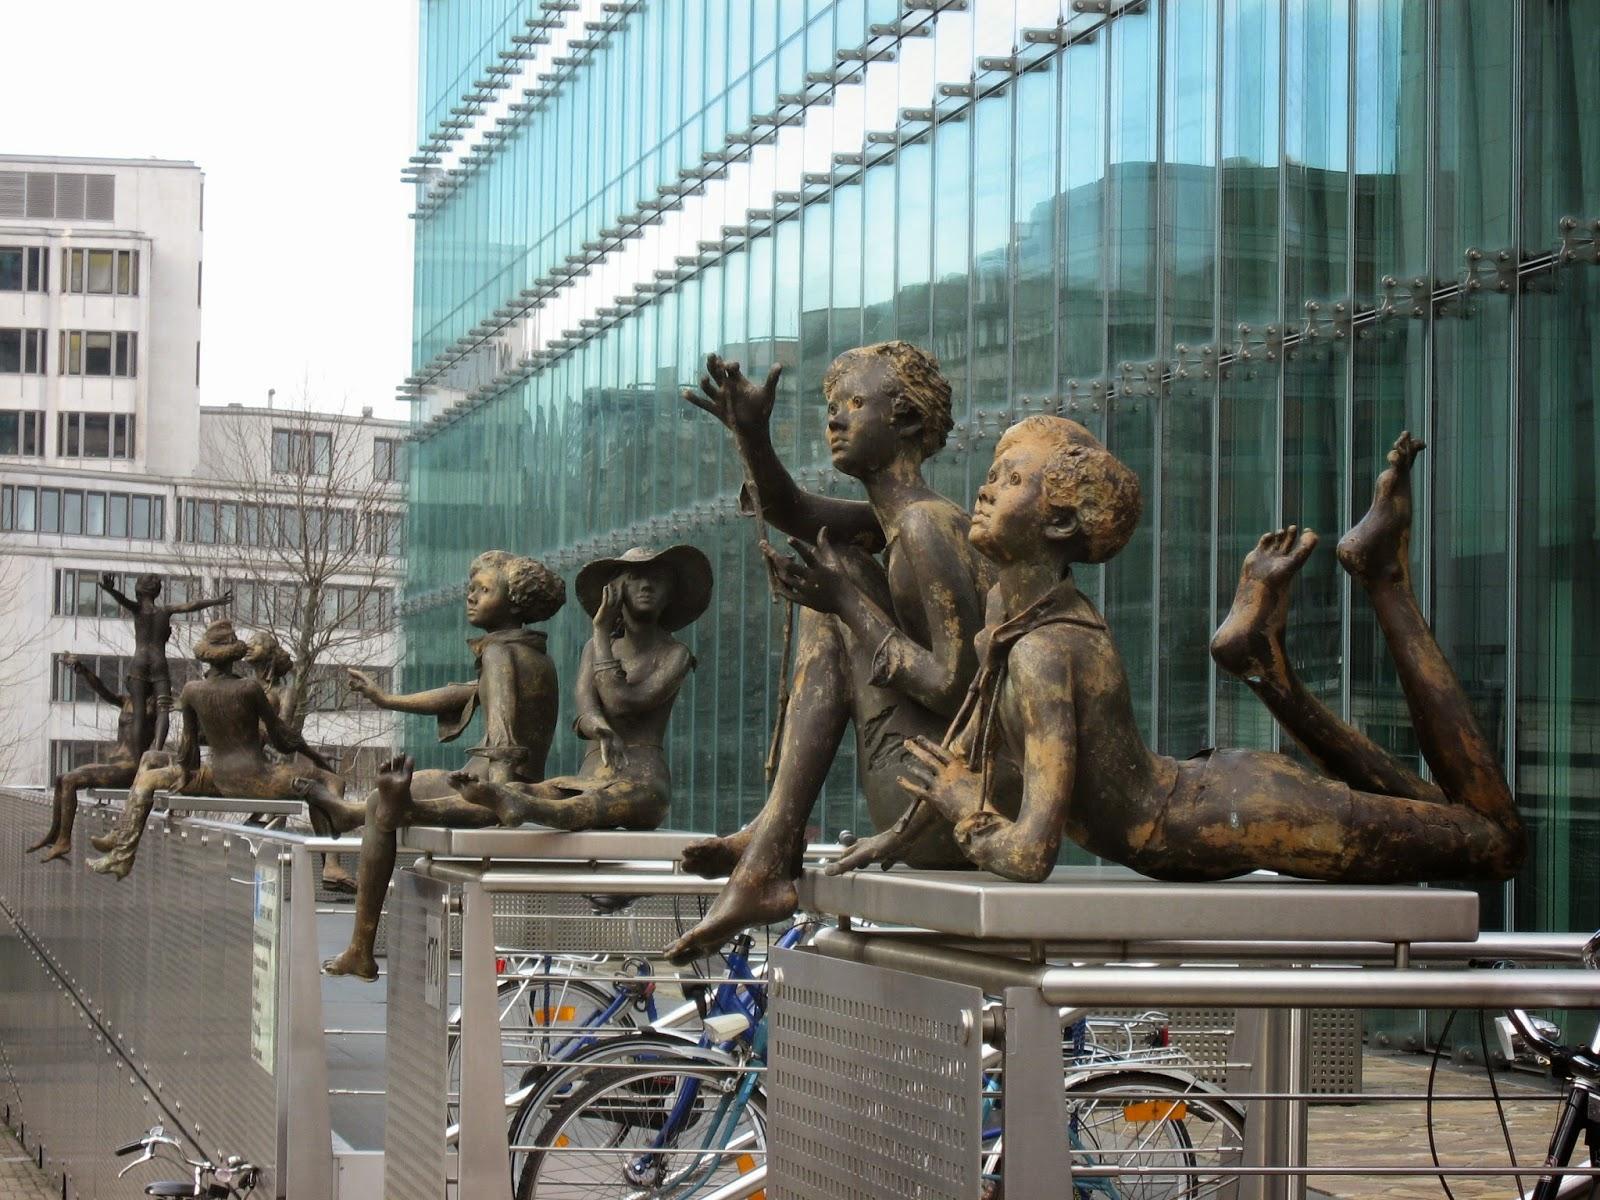 Eurogroup, ΕΚΤ, ελλαδα, ευρω, Ευρωζώνη, Ευρωπαϊκή Κεντρική Τράπεζα, ευρωπαϊκων, Ευρώπη, παράταση, ΣΟΙΜΠΛΕ, ΤΧΣ,